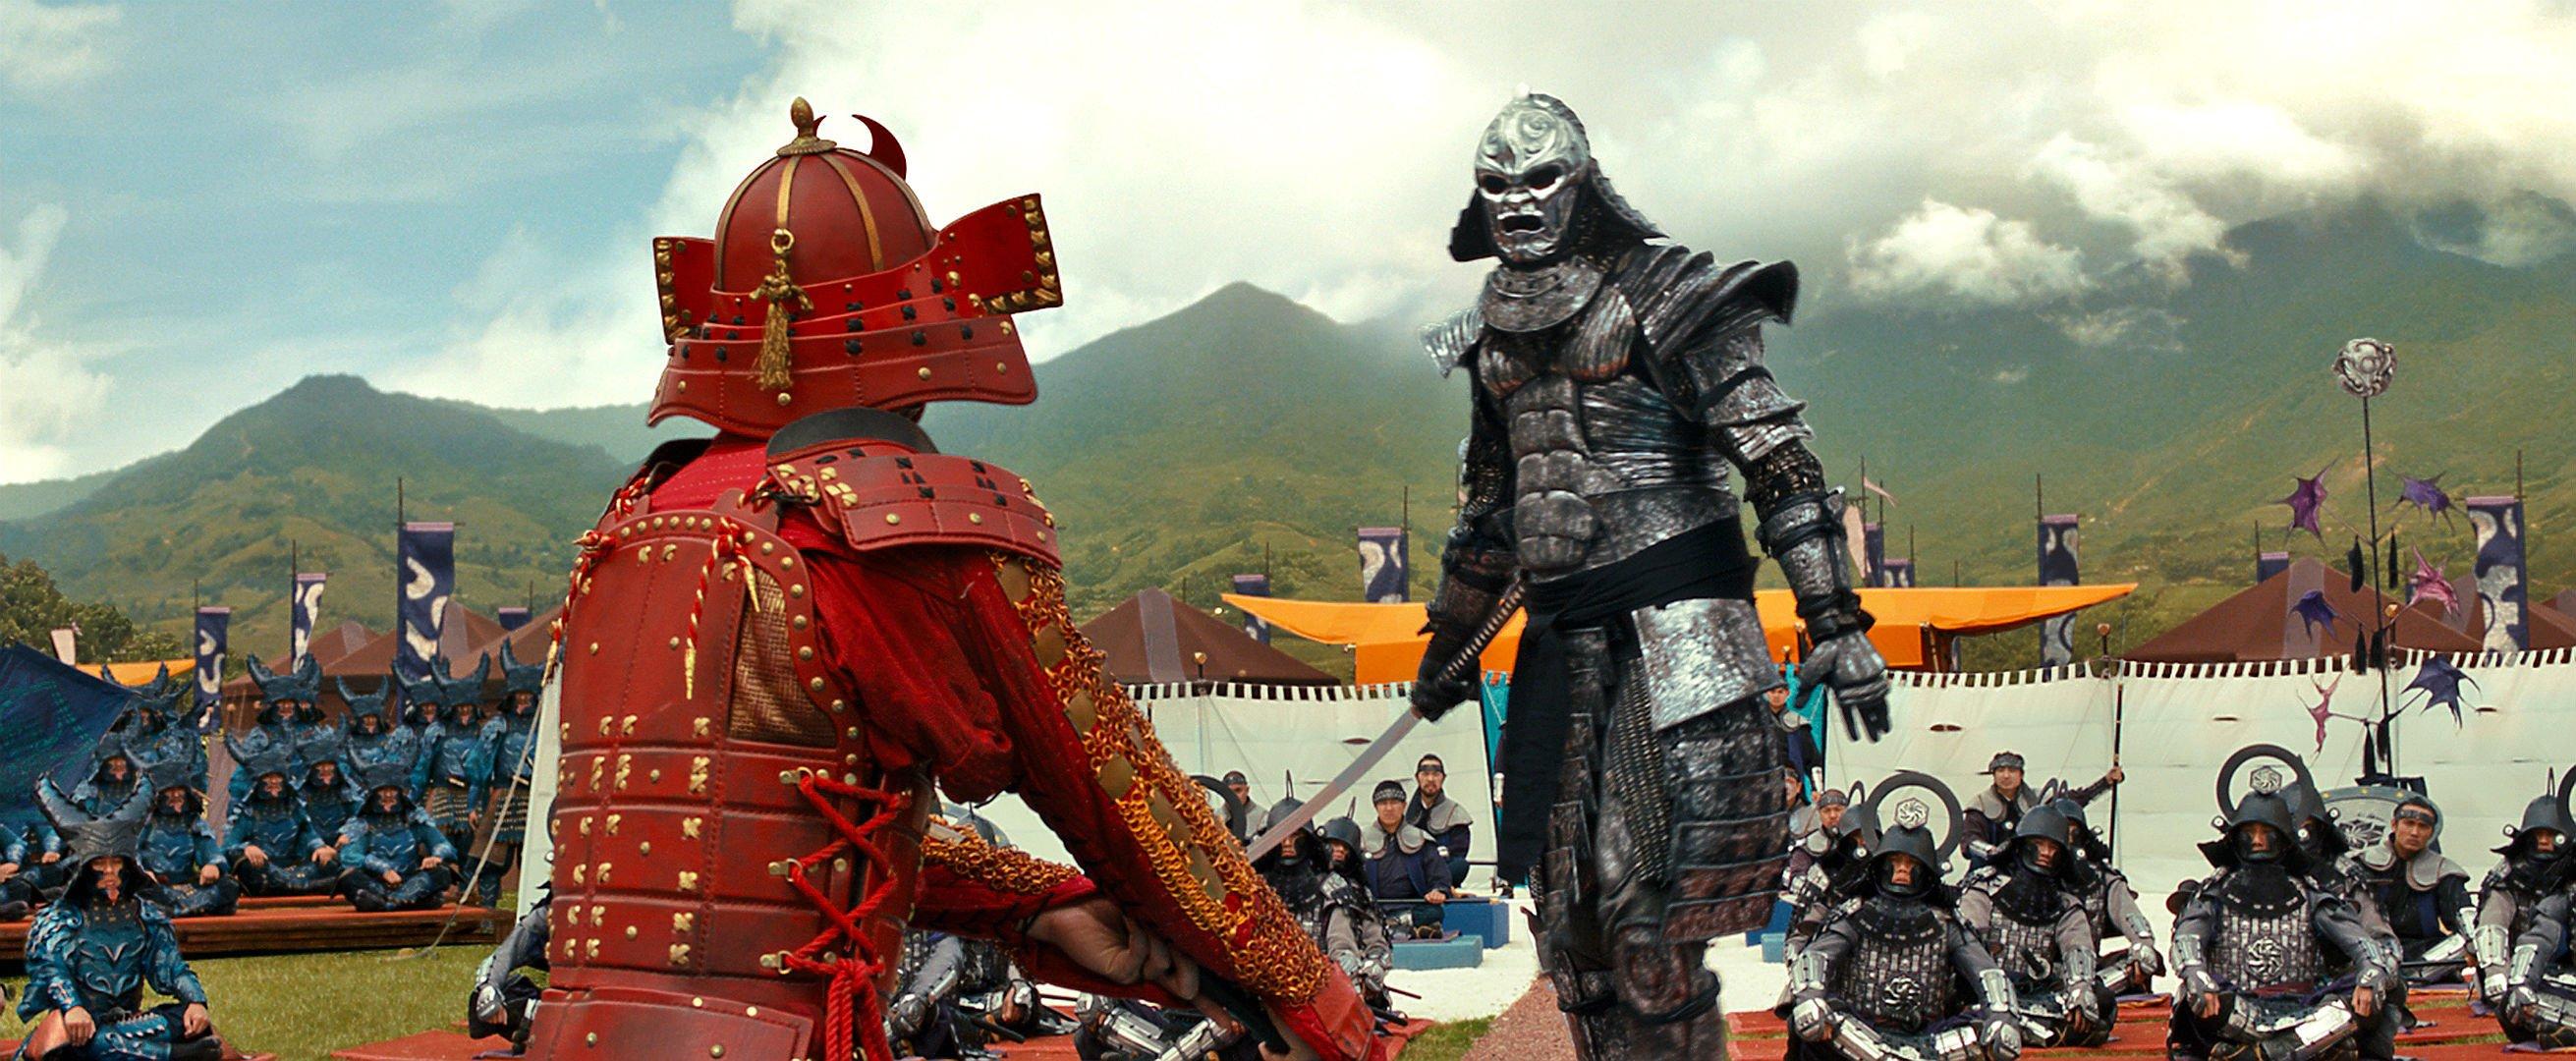 47 ronin action adventure fantasy martial arts ronin